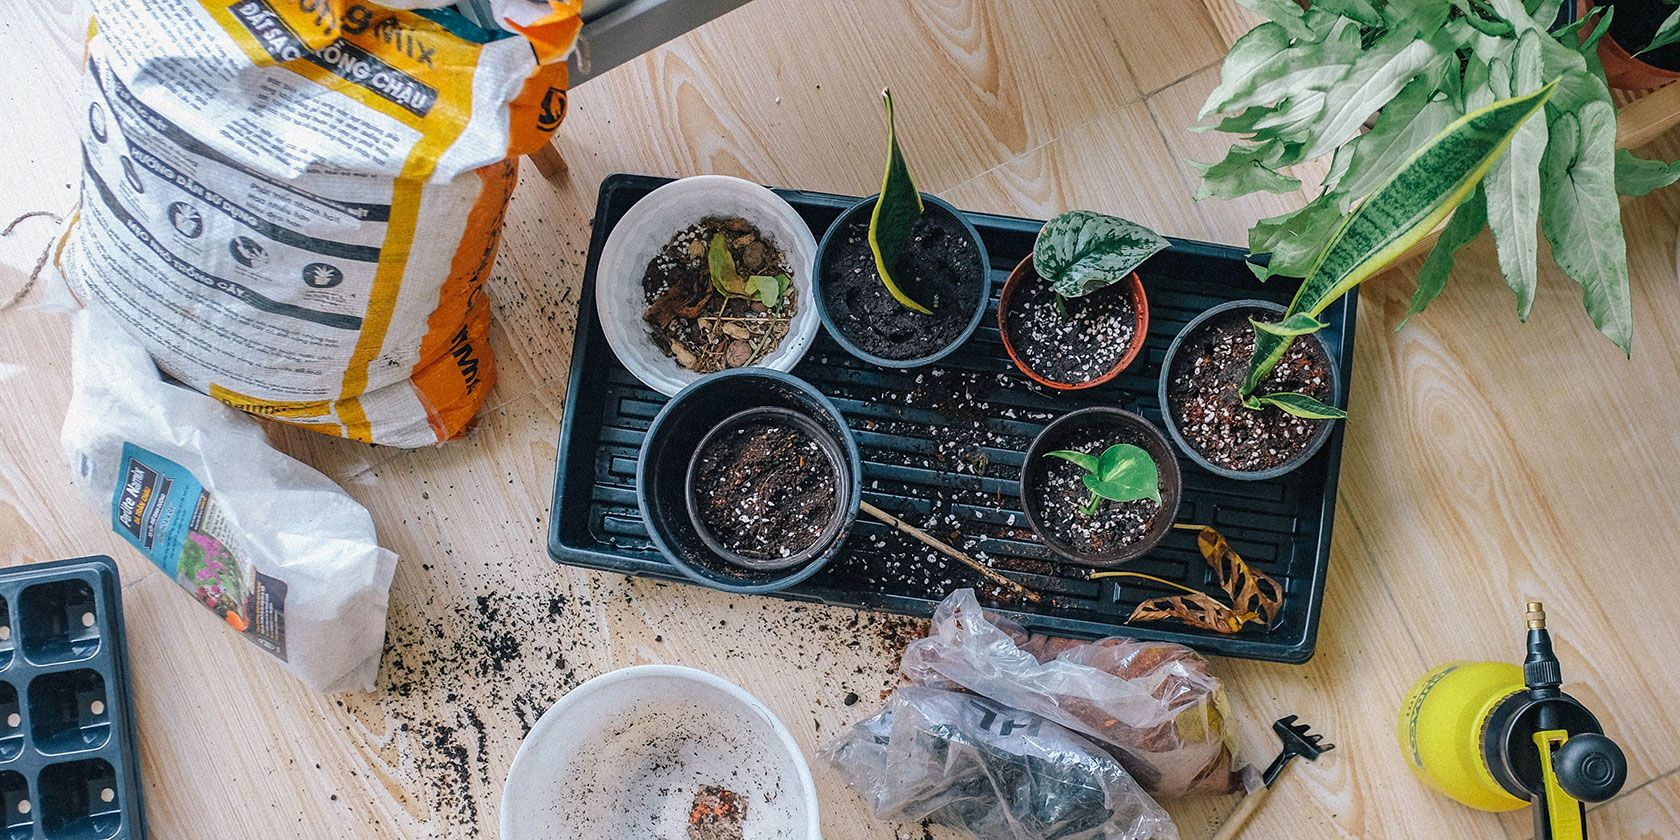 Gardening apps and websites